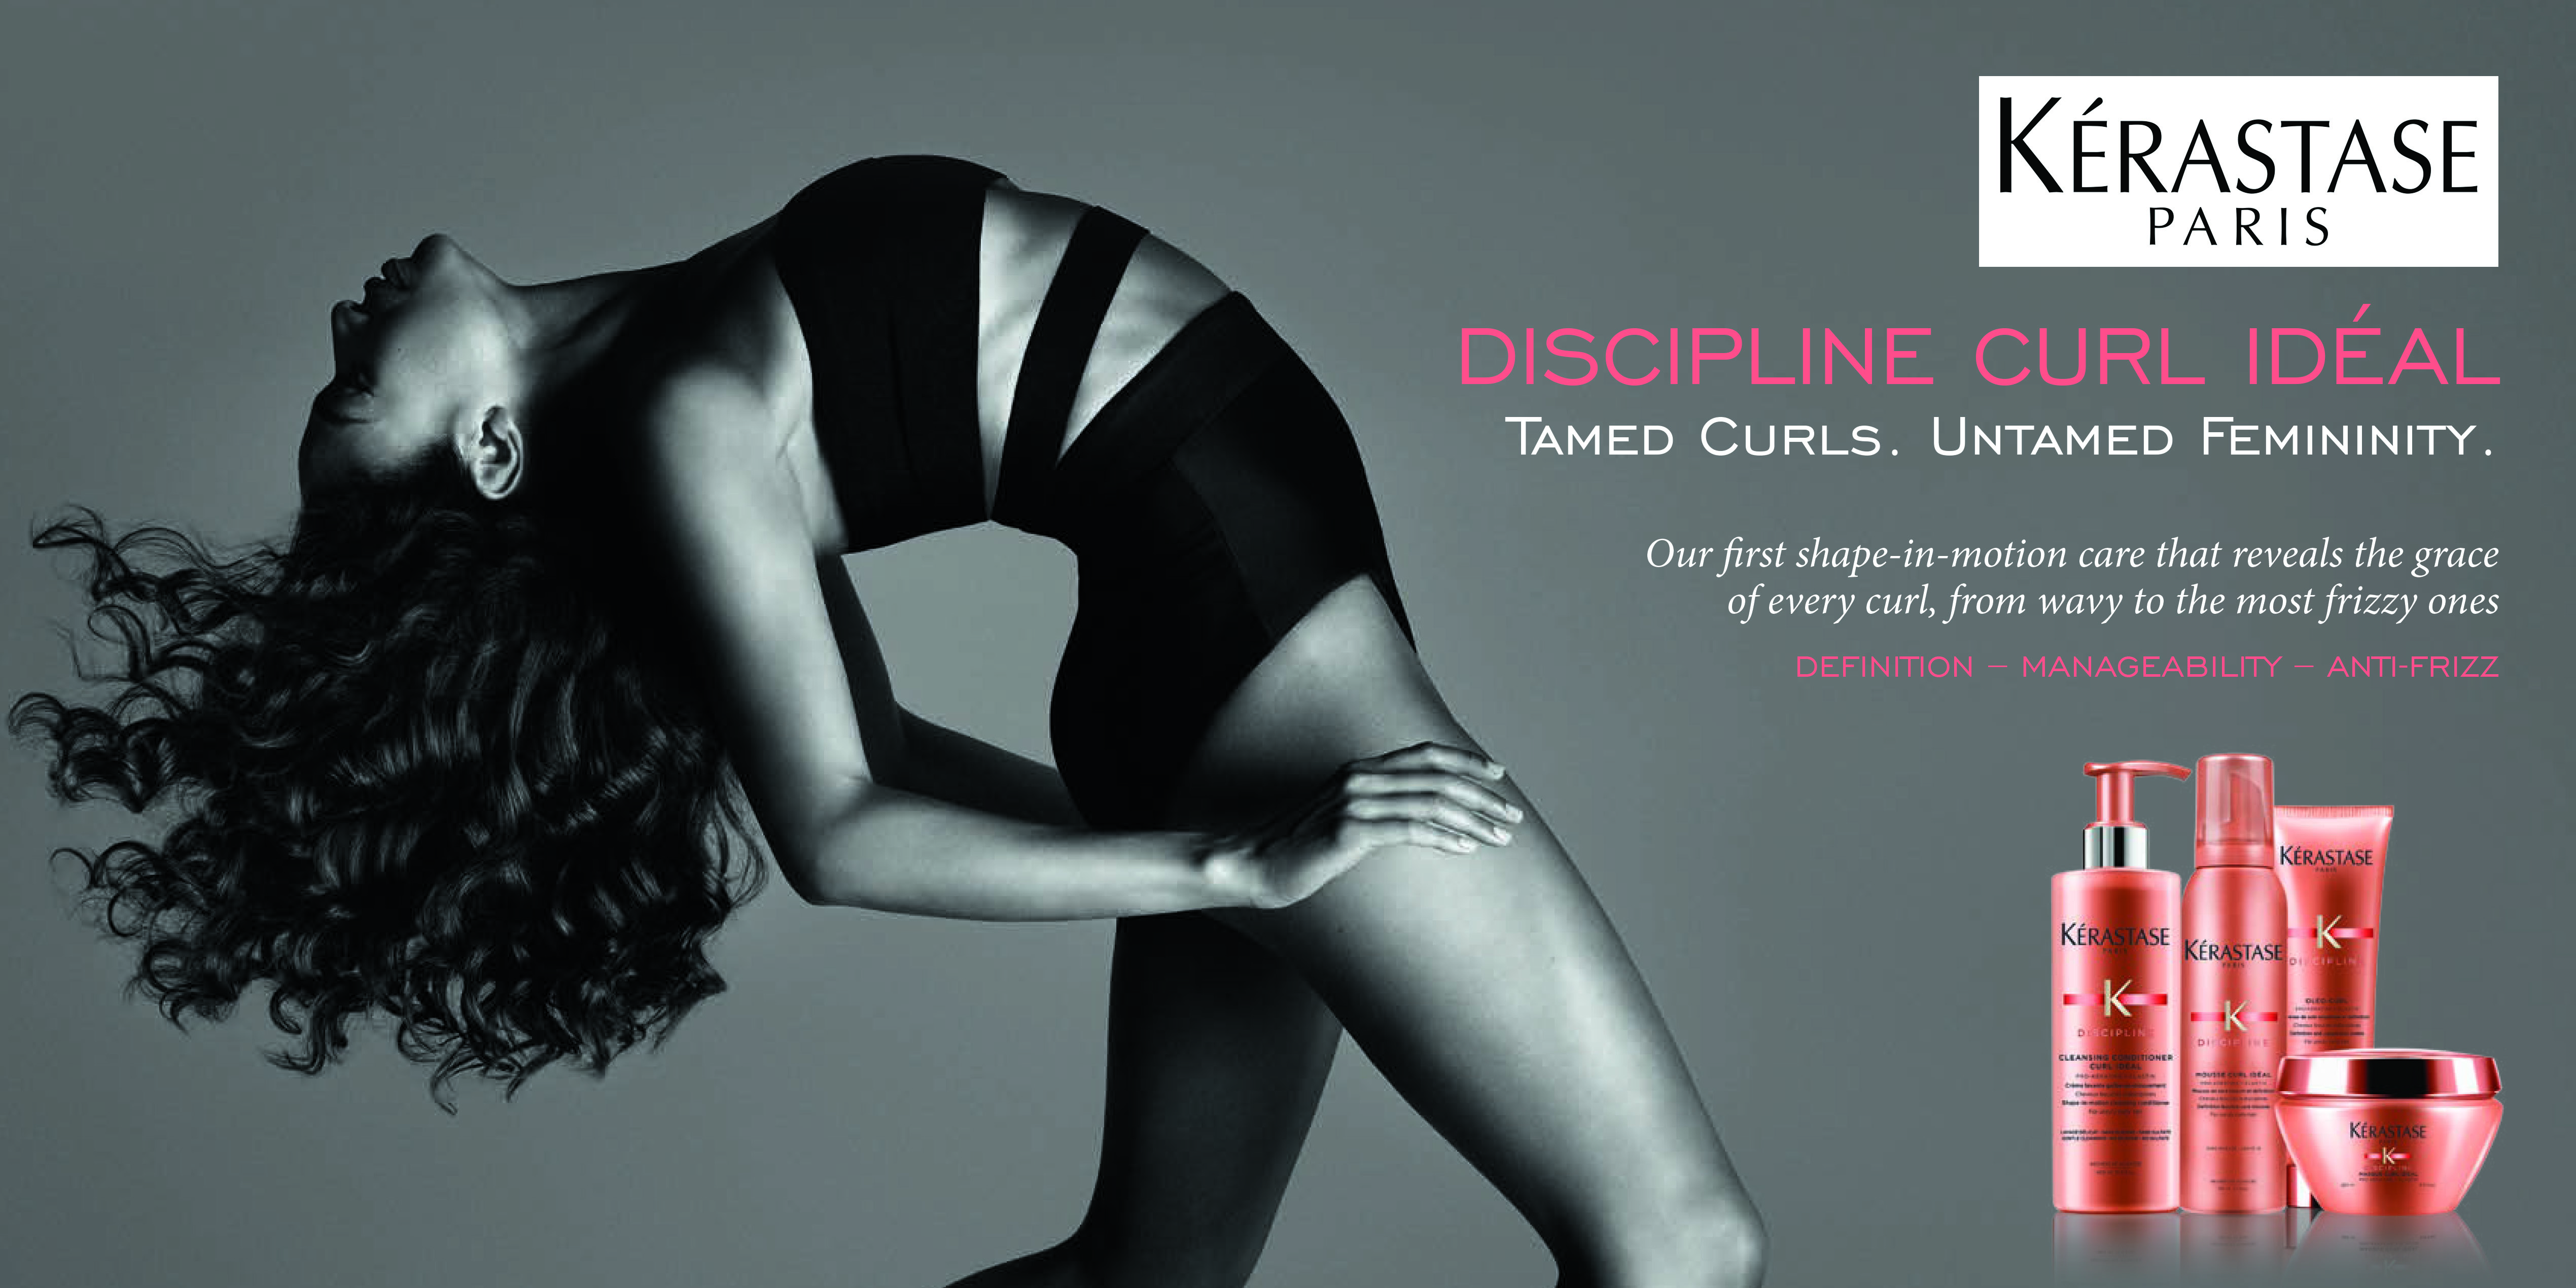 Kerastase-Discipline Curl Ideal-1